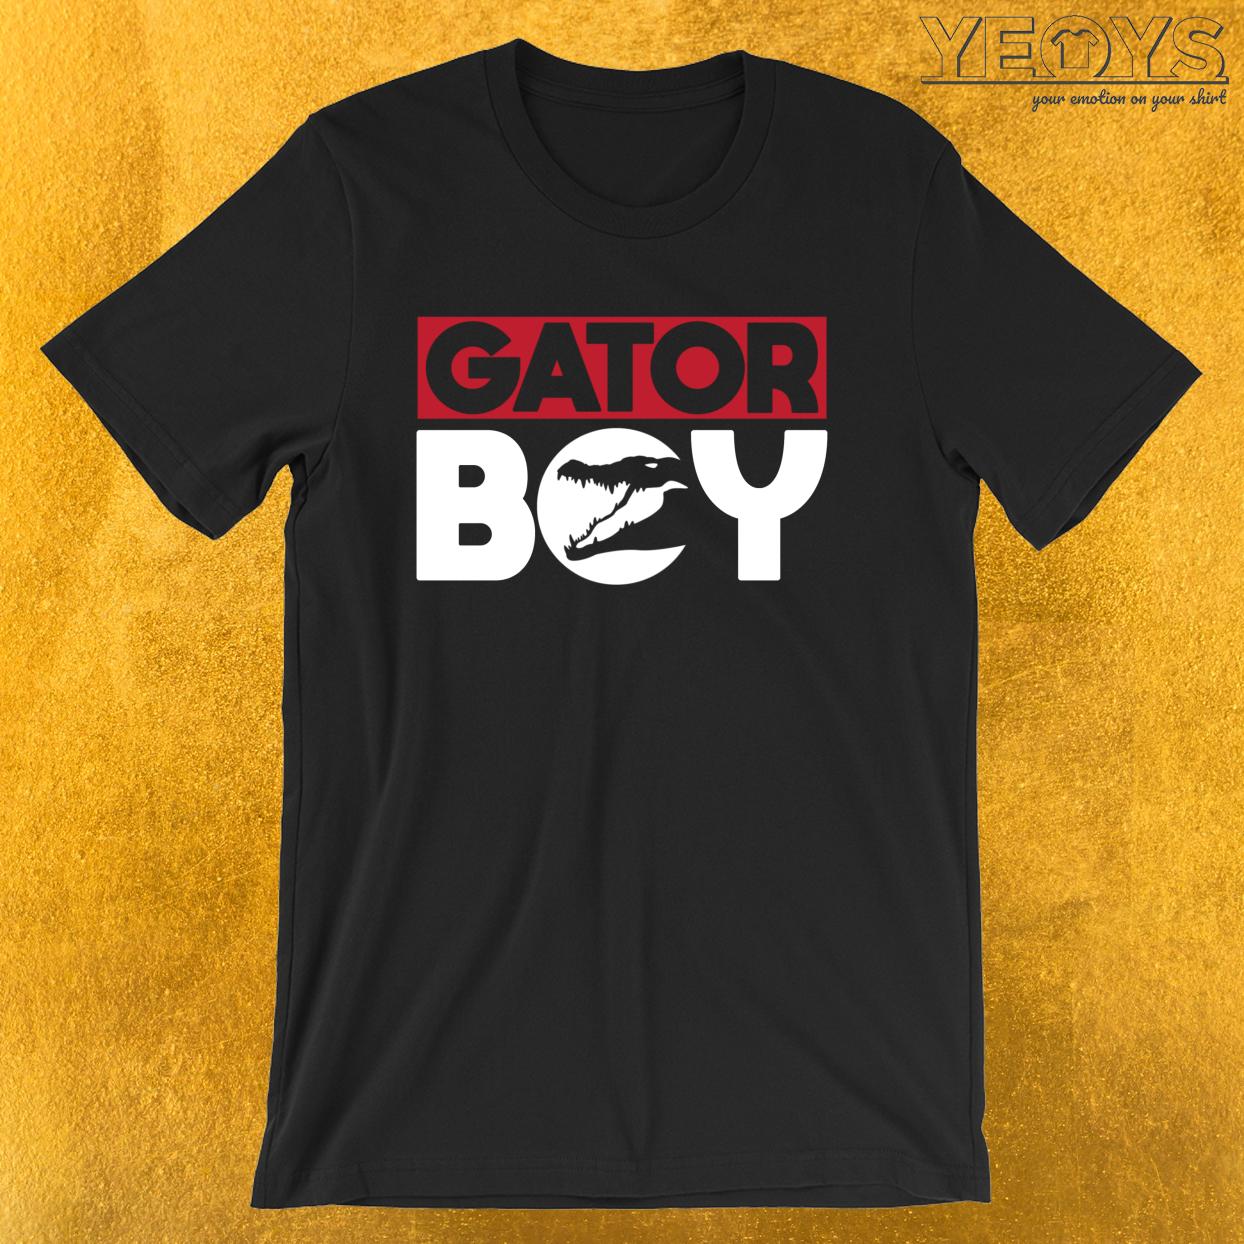 Gator Boy – Reptile Party Alligator Tee